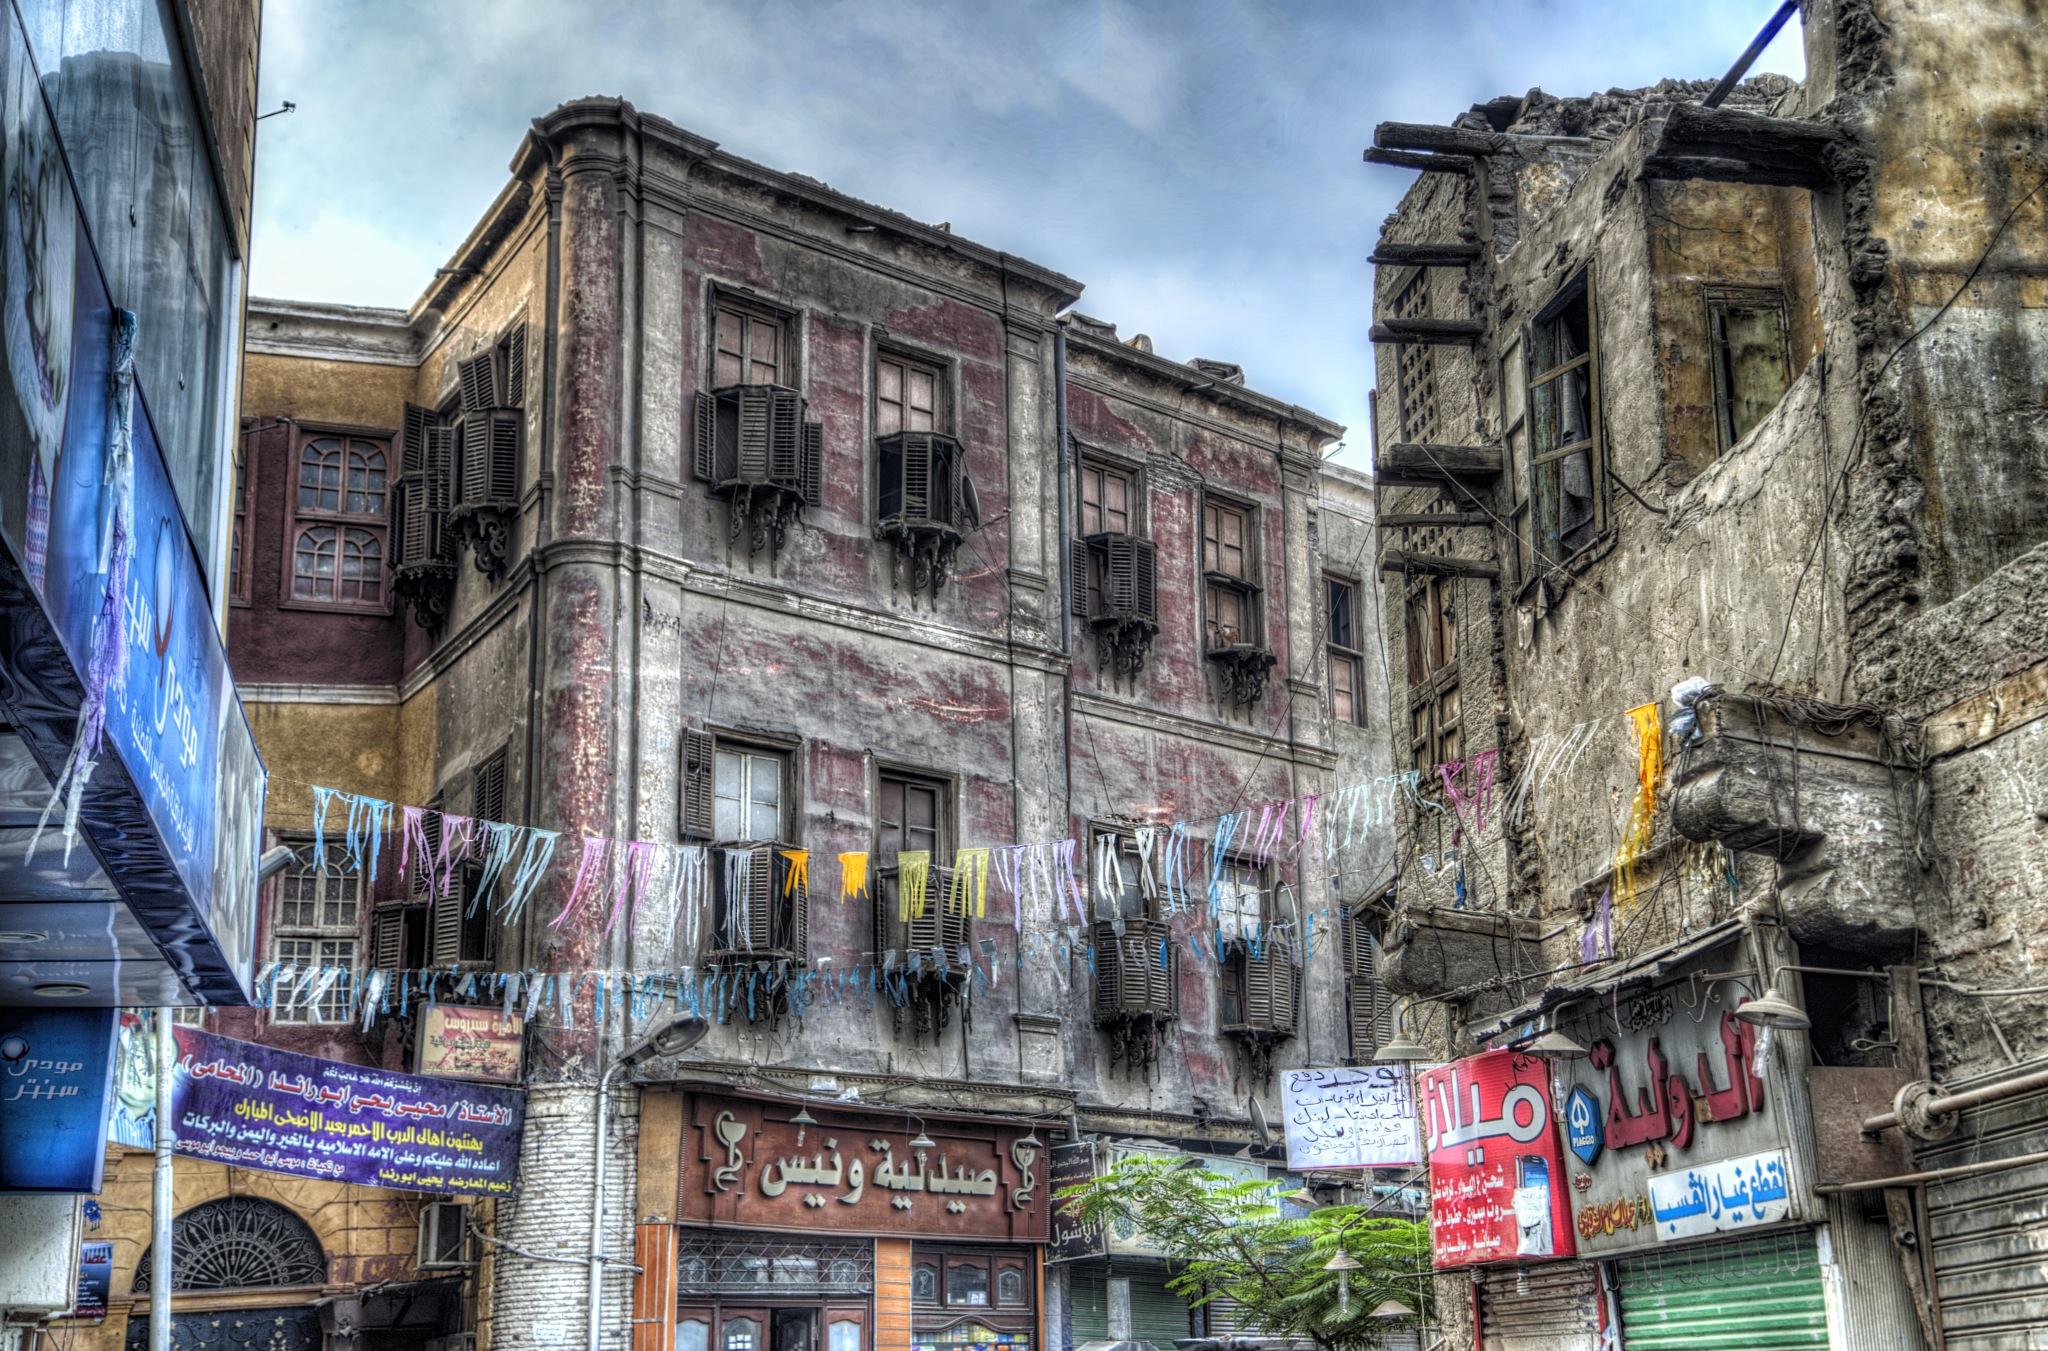 Bab El Wazeer Street by Tawfik W Dajani